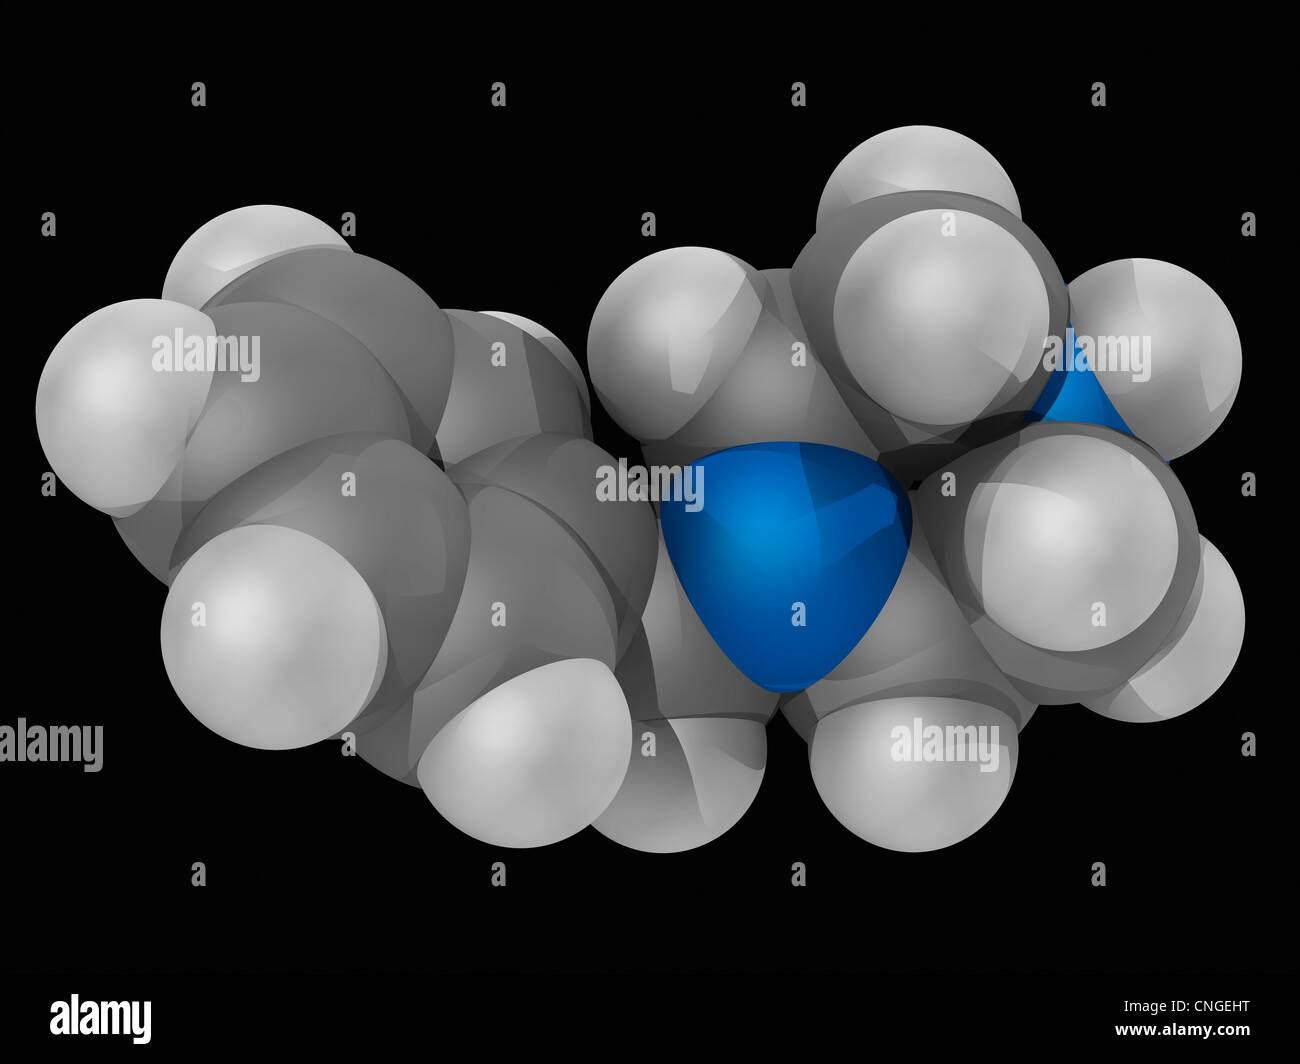 Benzylpiperazine (BZB) molécula de drogas Imagen De Stock